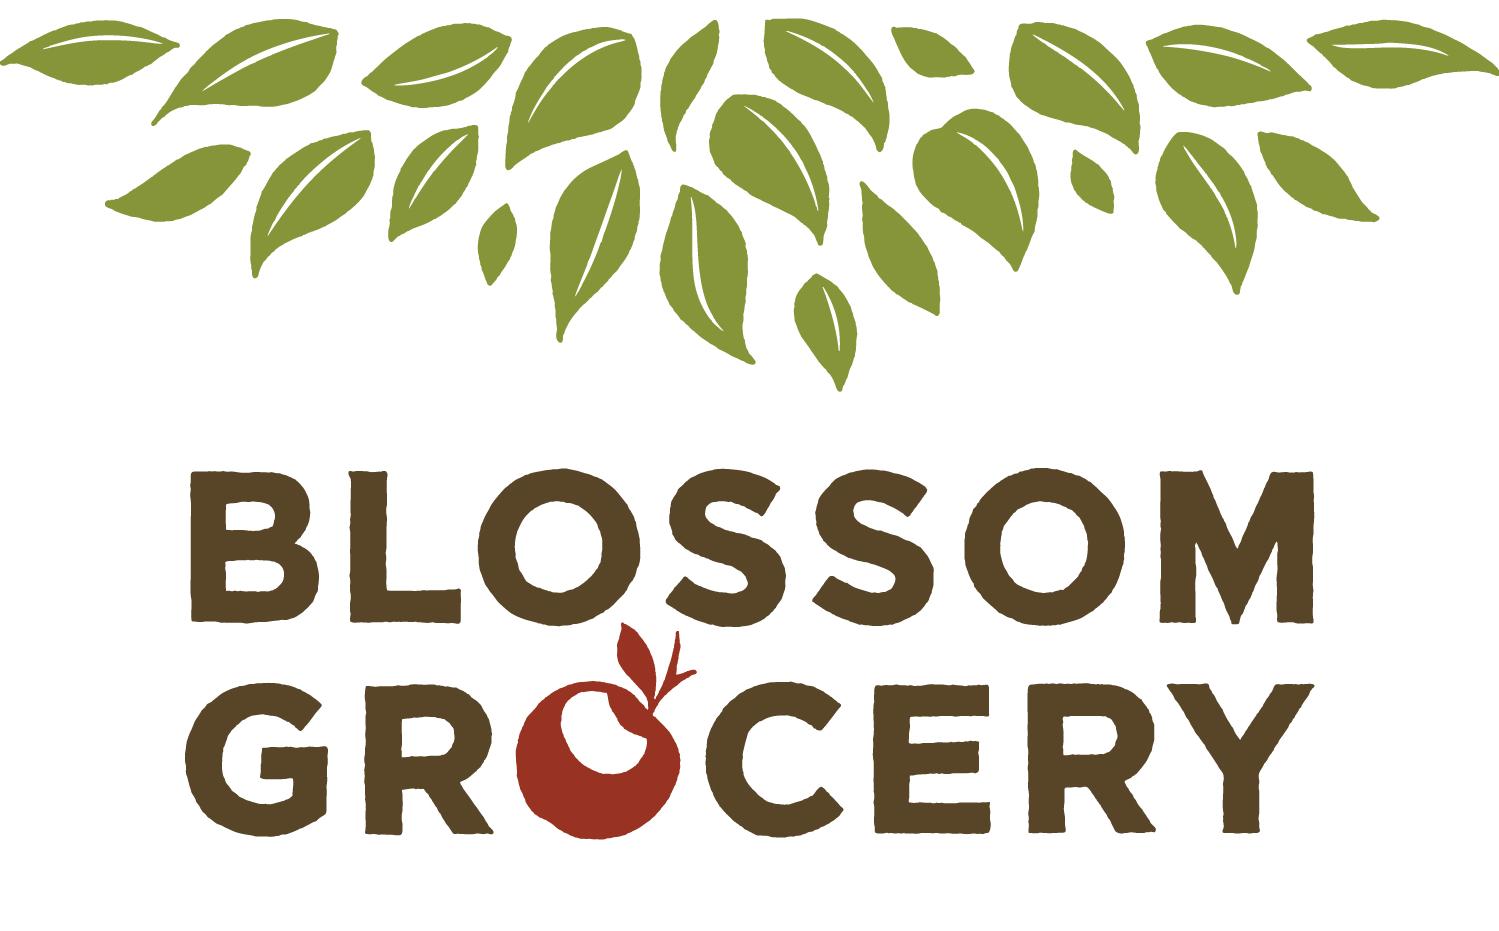 Blossom Grocery